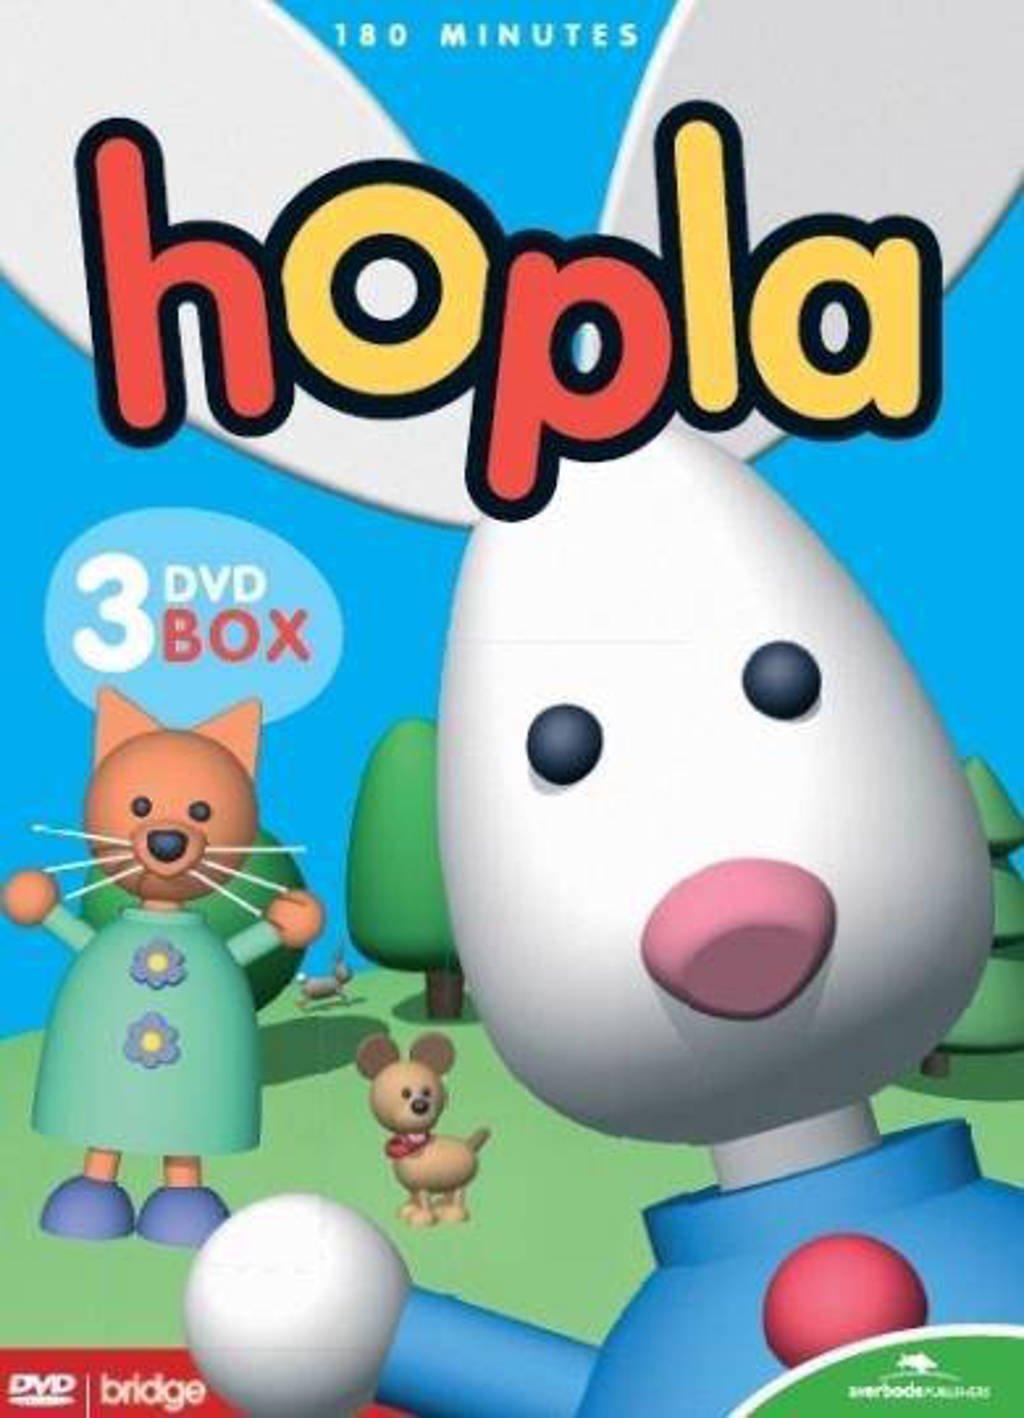 Hopla box (DVD)